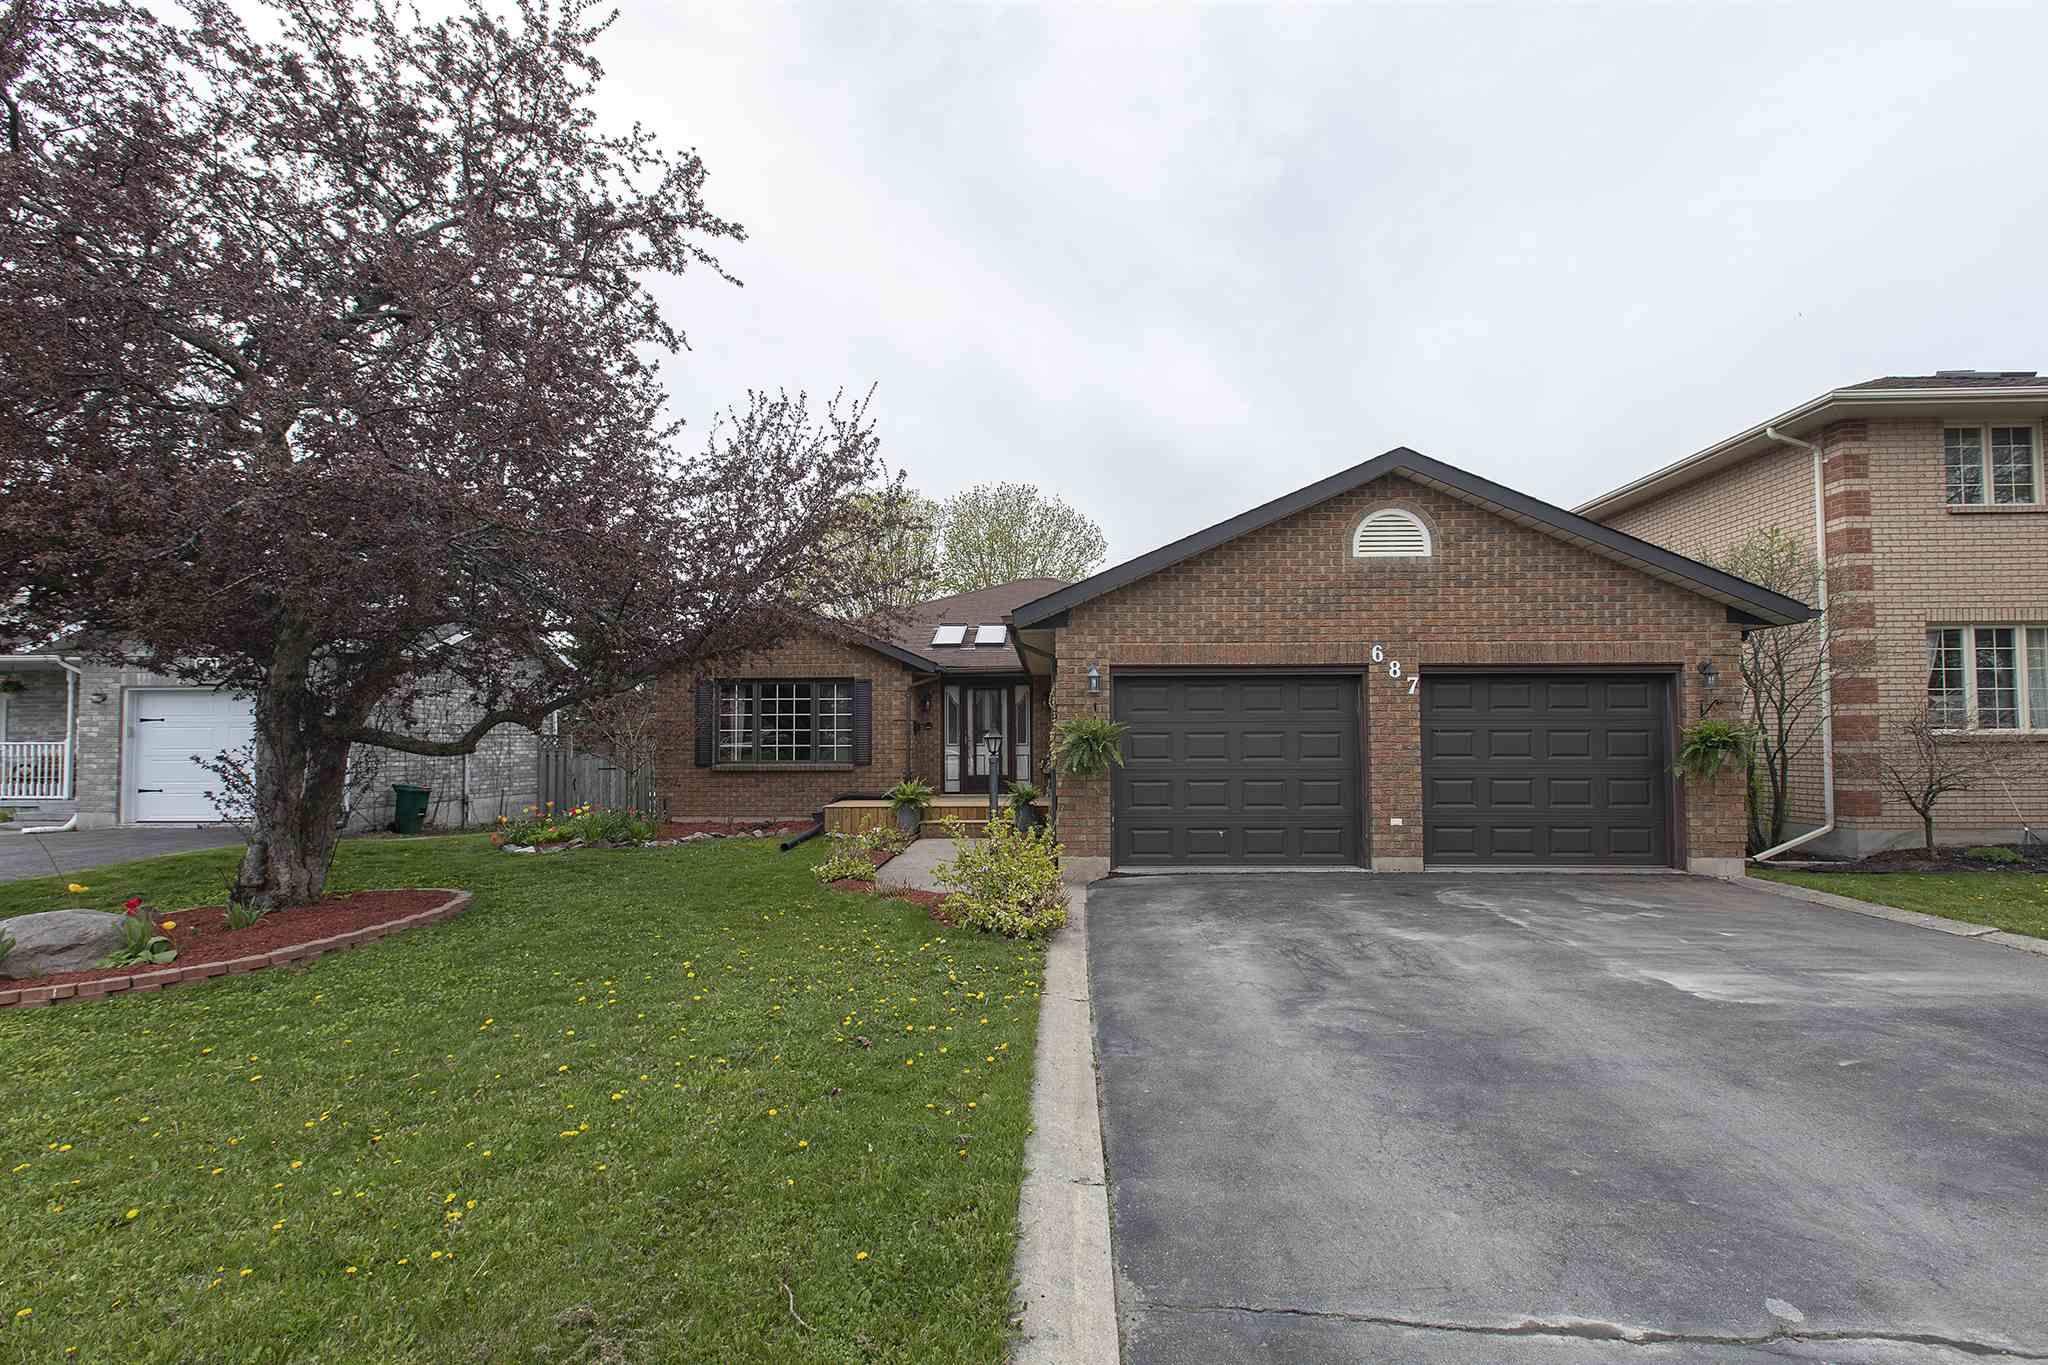 687 Muirfield Crescent, Kingston, Ontario, Canada